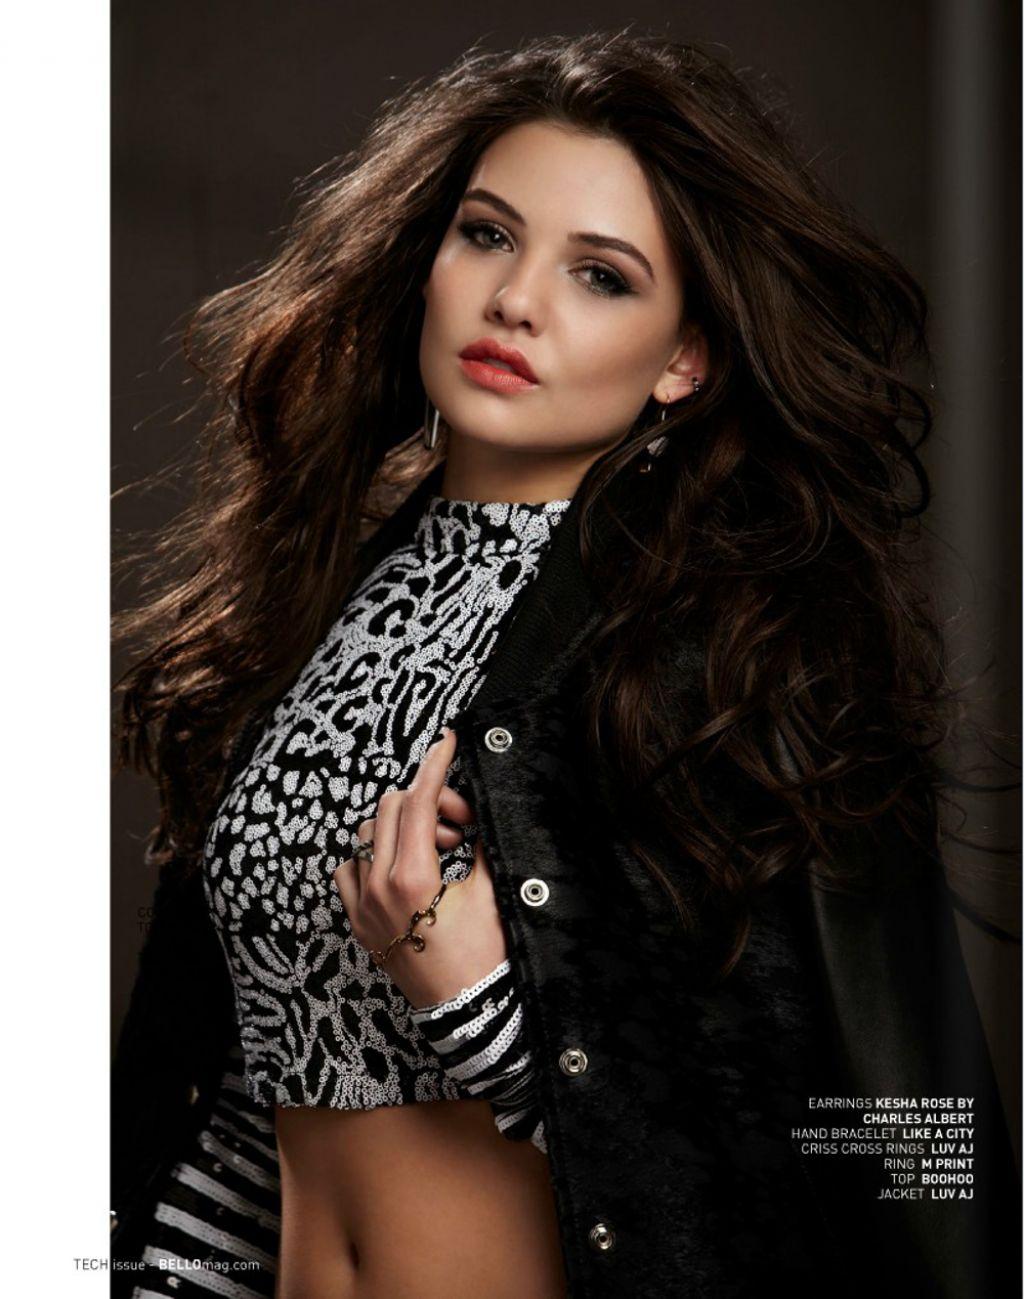 Danielle Campbell     BELLO Magazine     January 2014 IssueDanielle Campbell 2014 Boyfriend